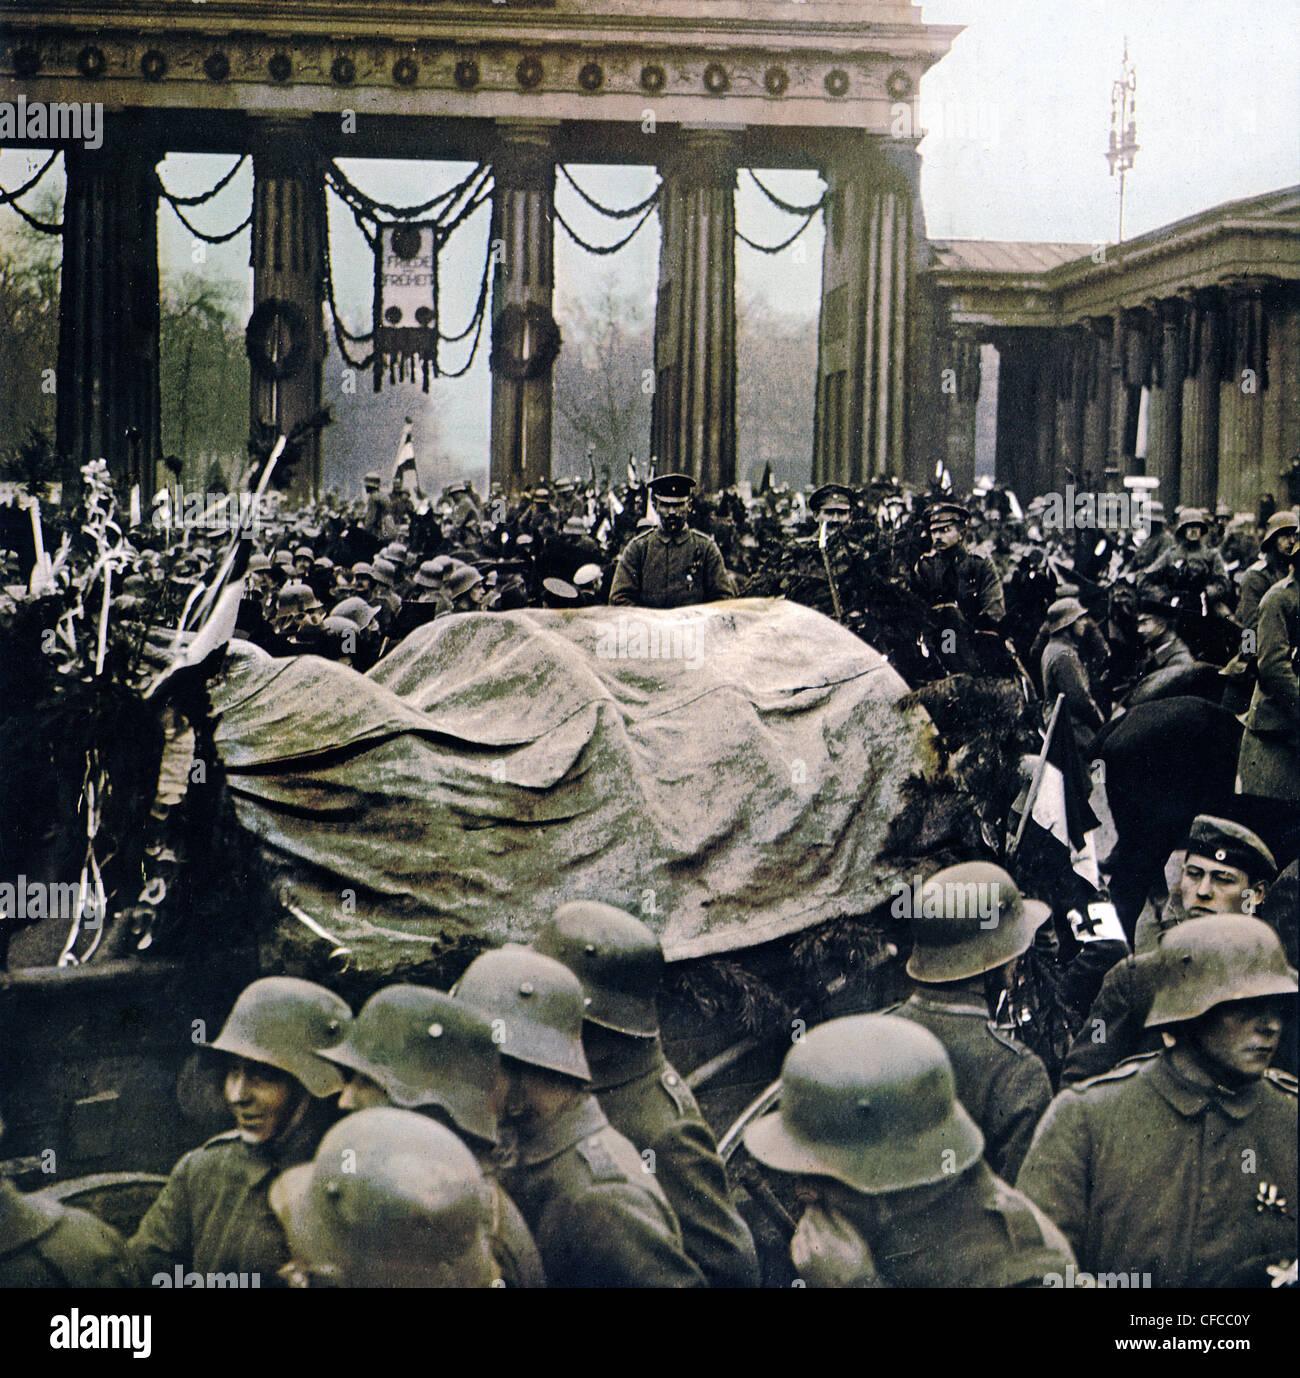 armed, troops, front, Captain Pabst, marching, Brandenburg Gate, Berlin, disarm, revolution, World War I, War, World - Stock Image